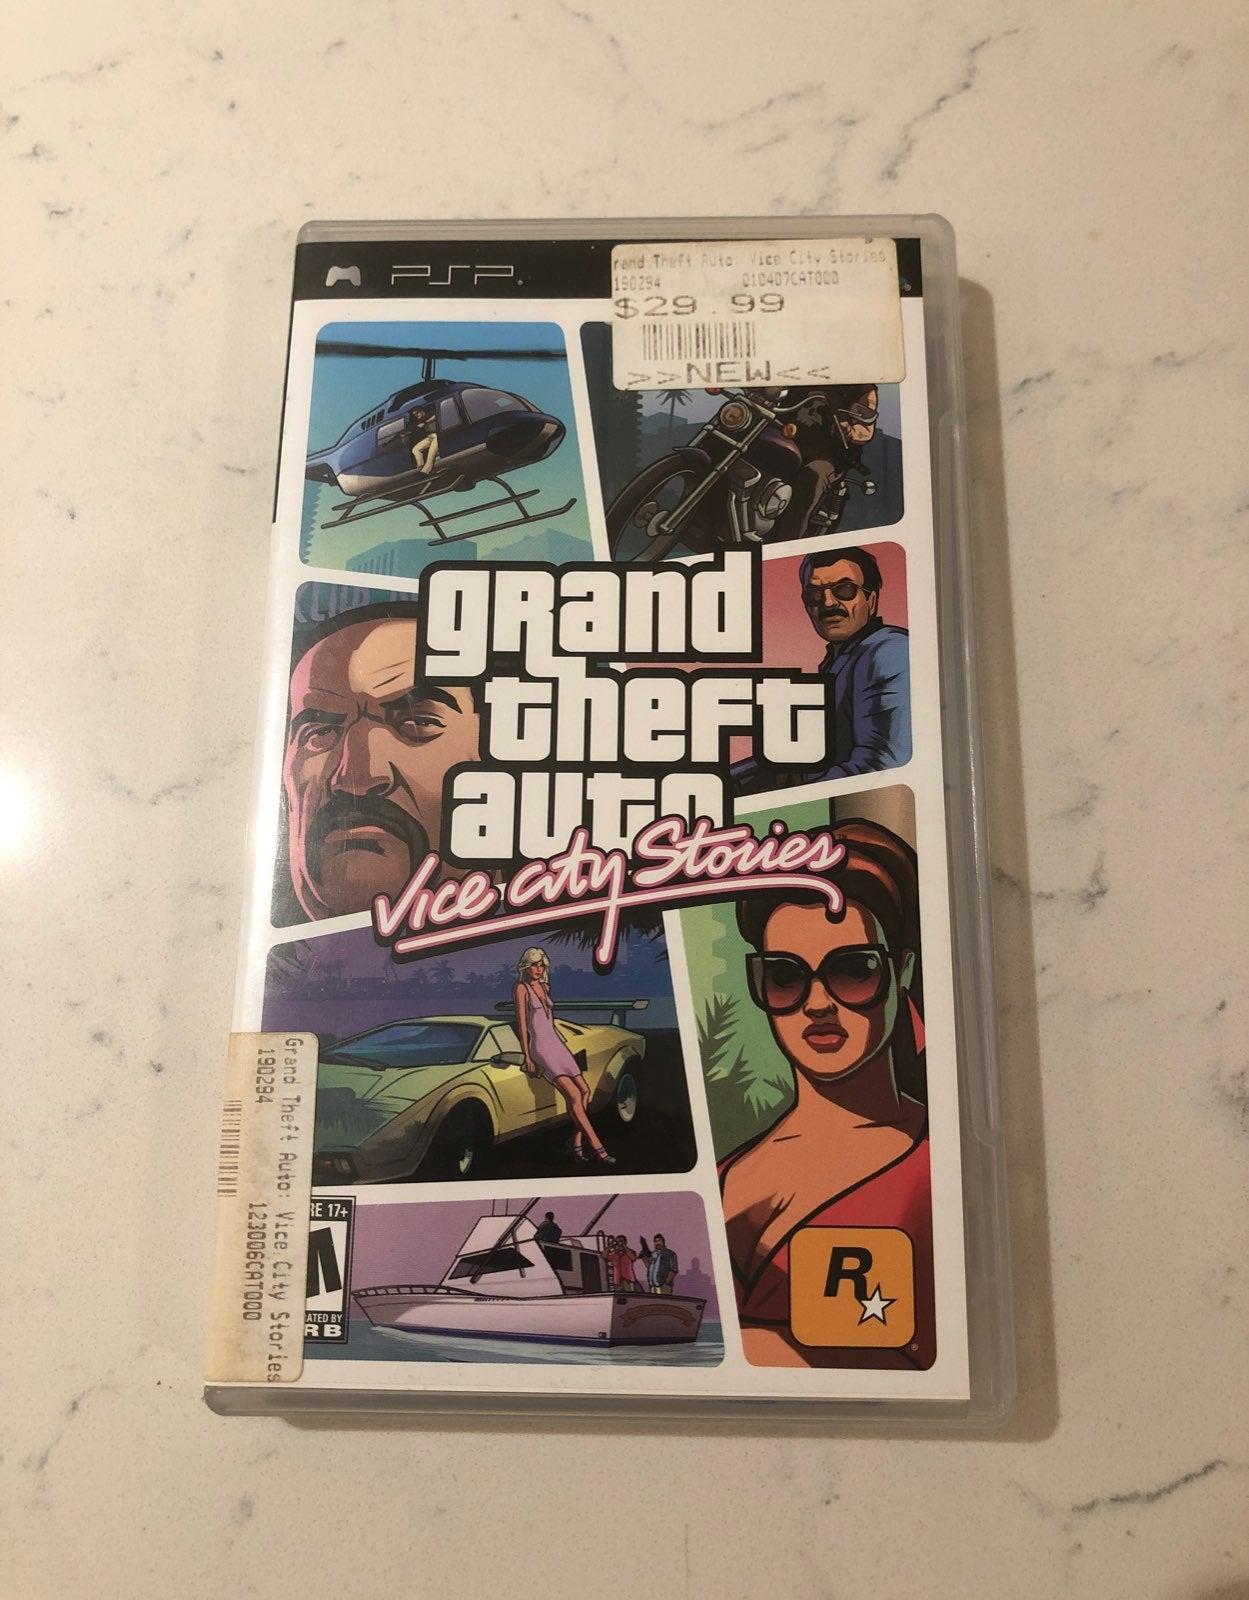 Grand Theft Auto: Vice City Stories on S